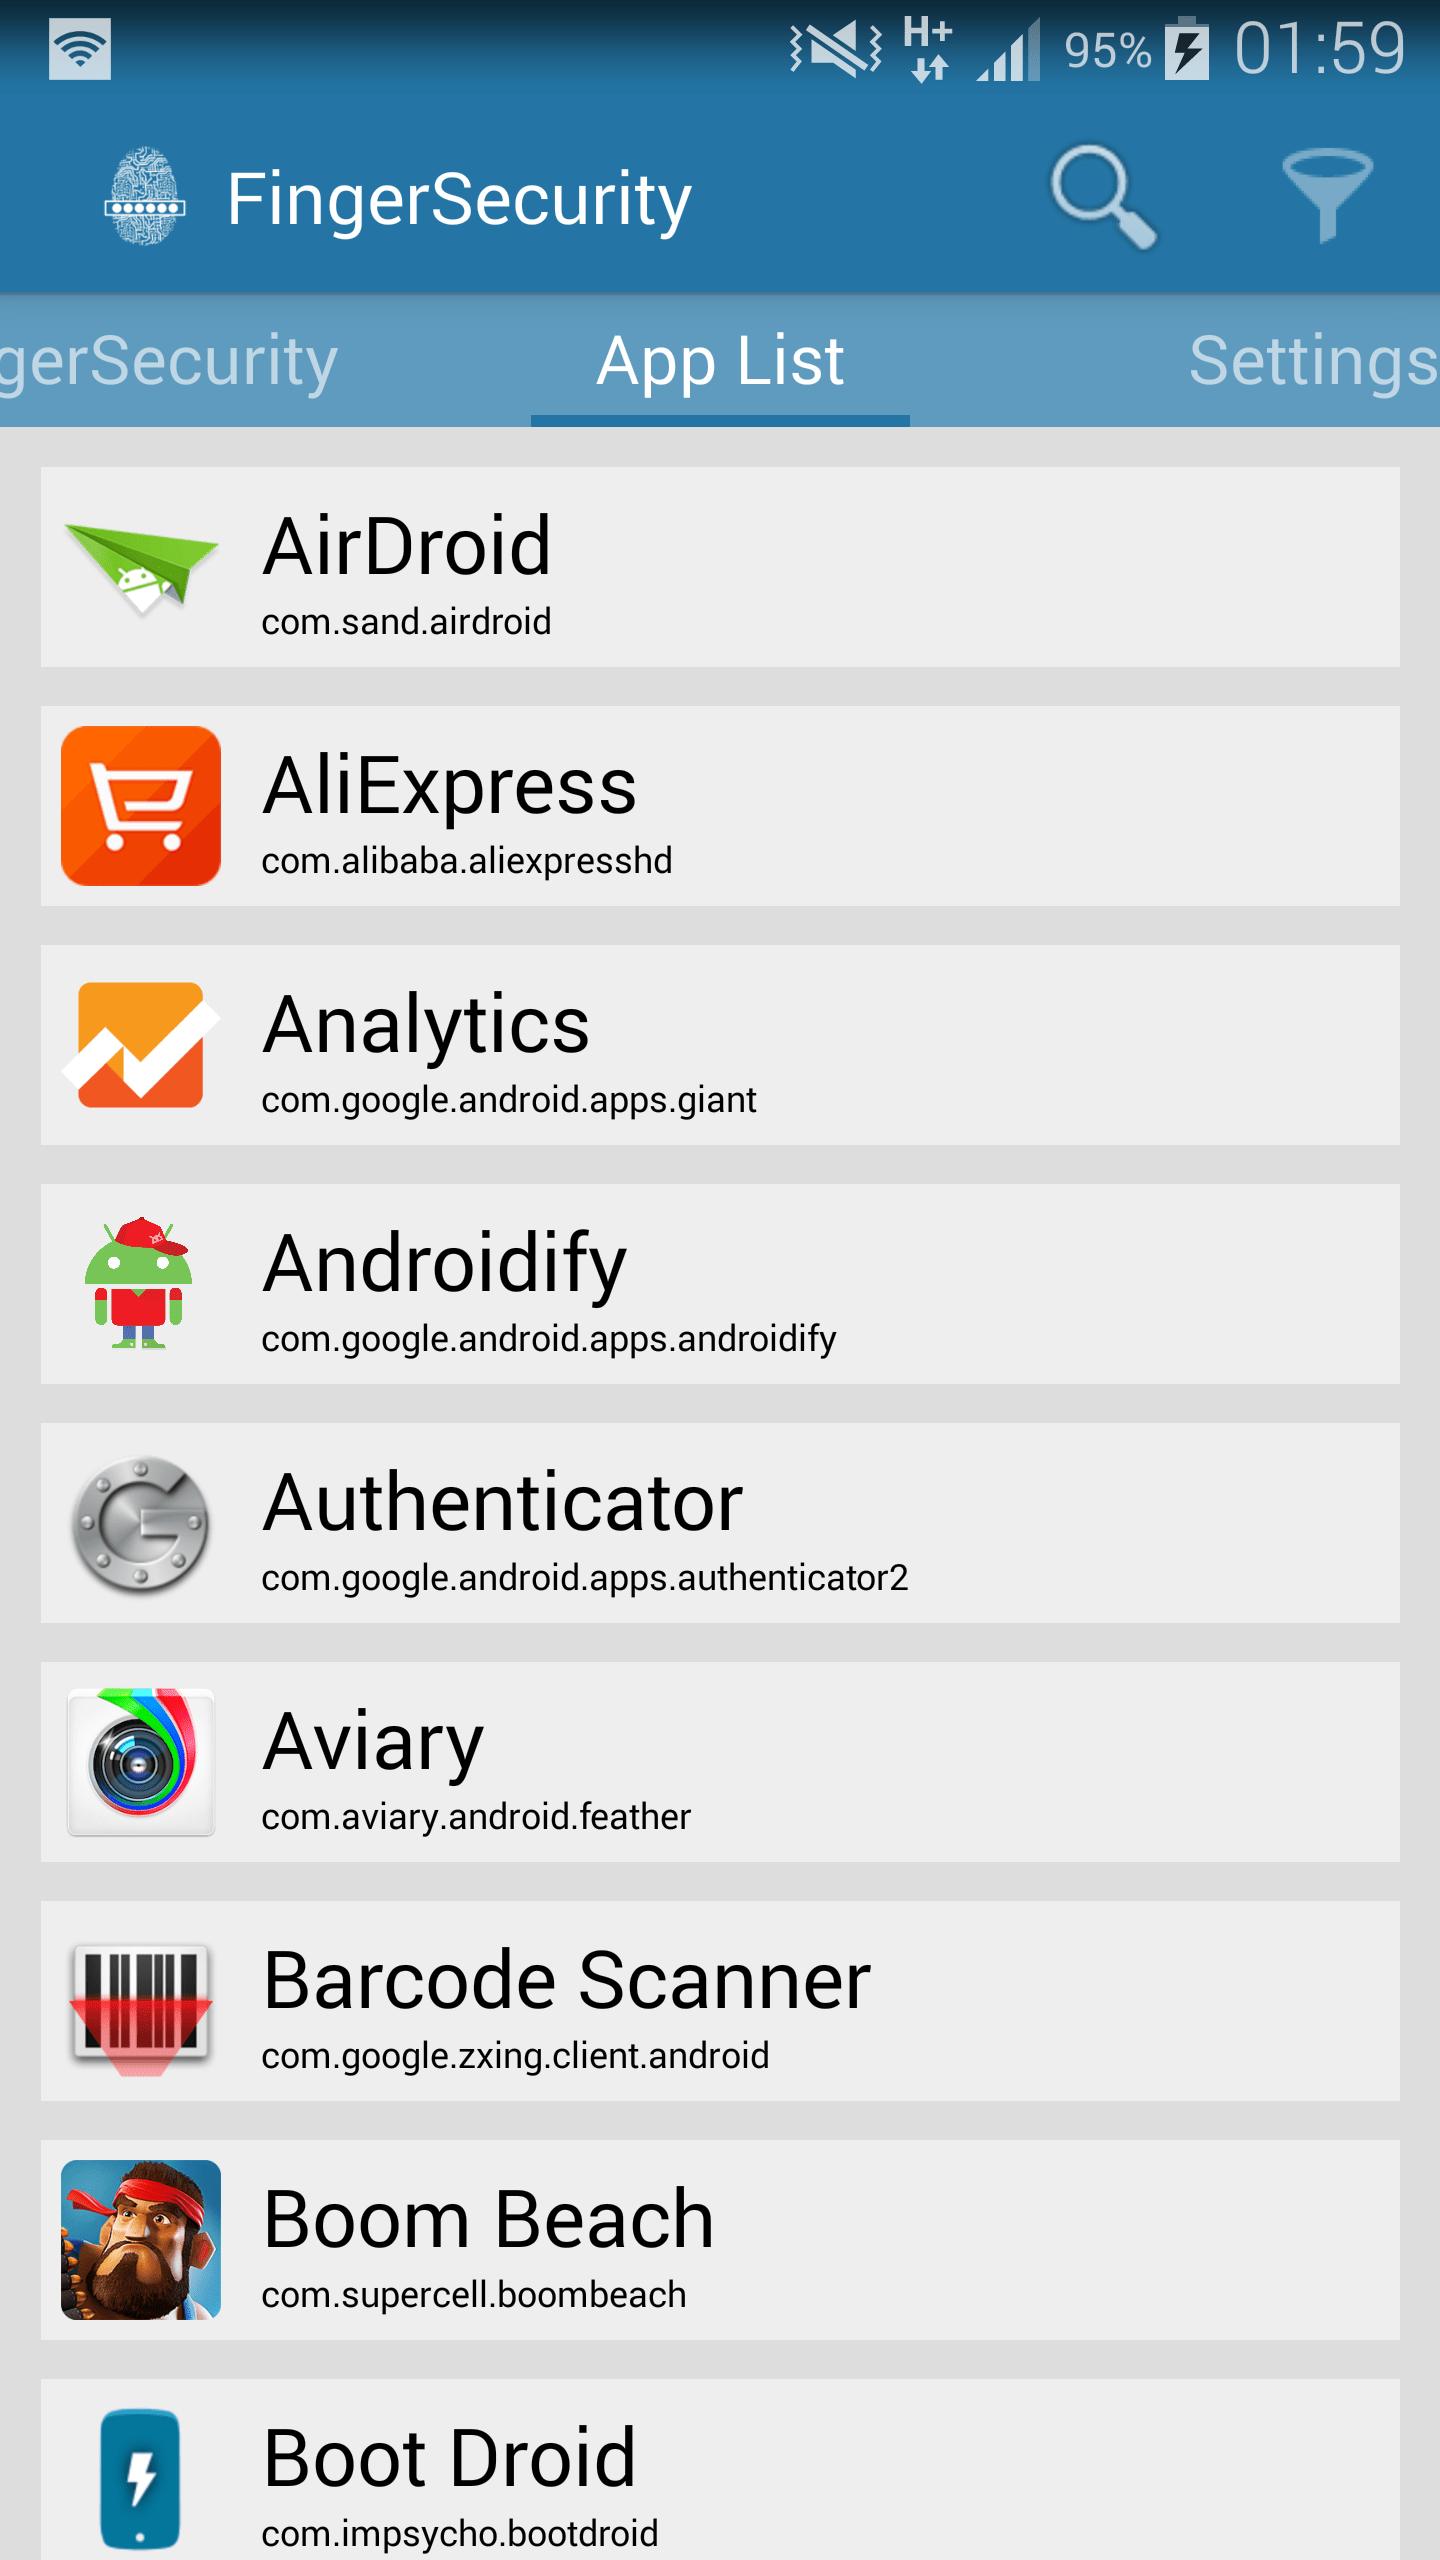 Lock Apps Using Fingerprint Scanner with FingerSecurity